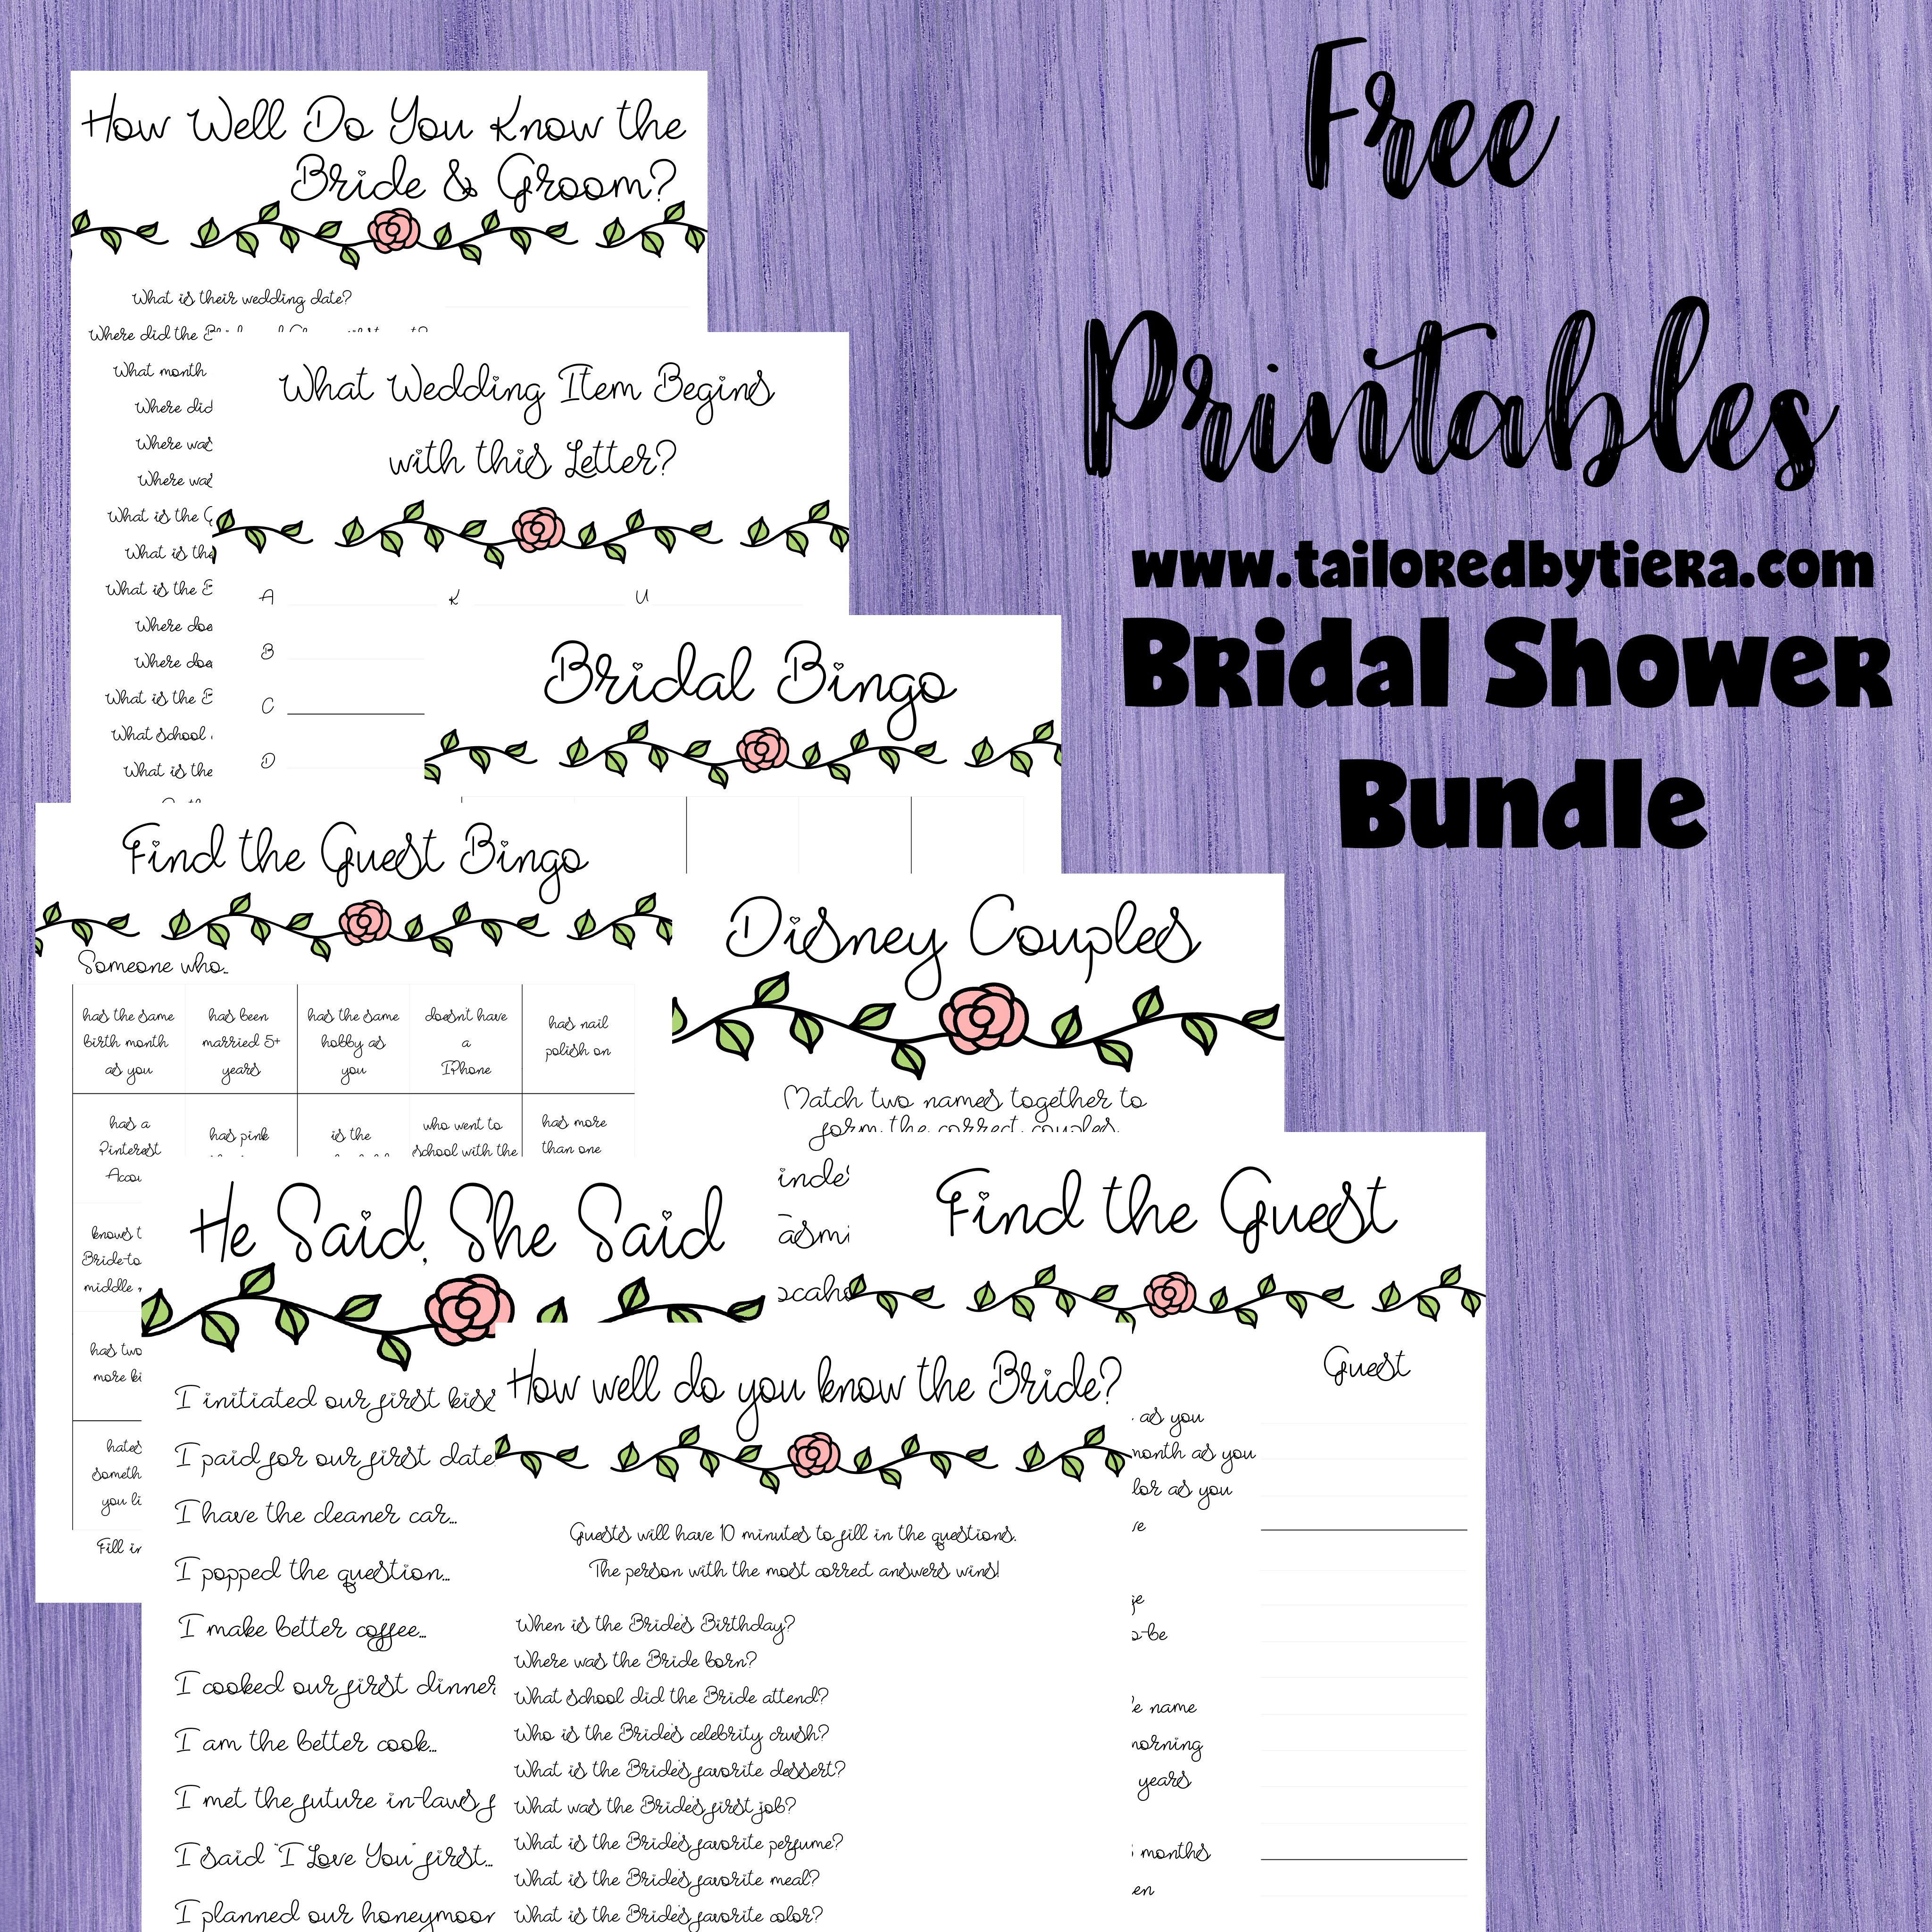 Medium Crop Of Bridal Shower Games Free